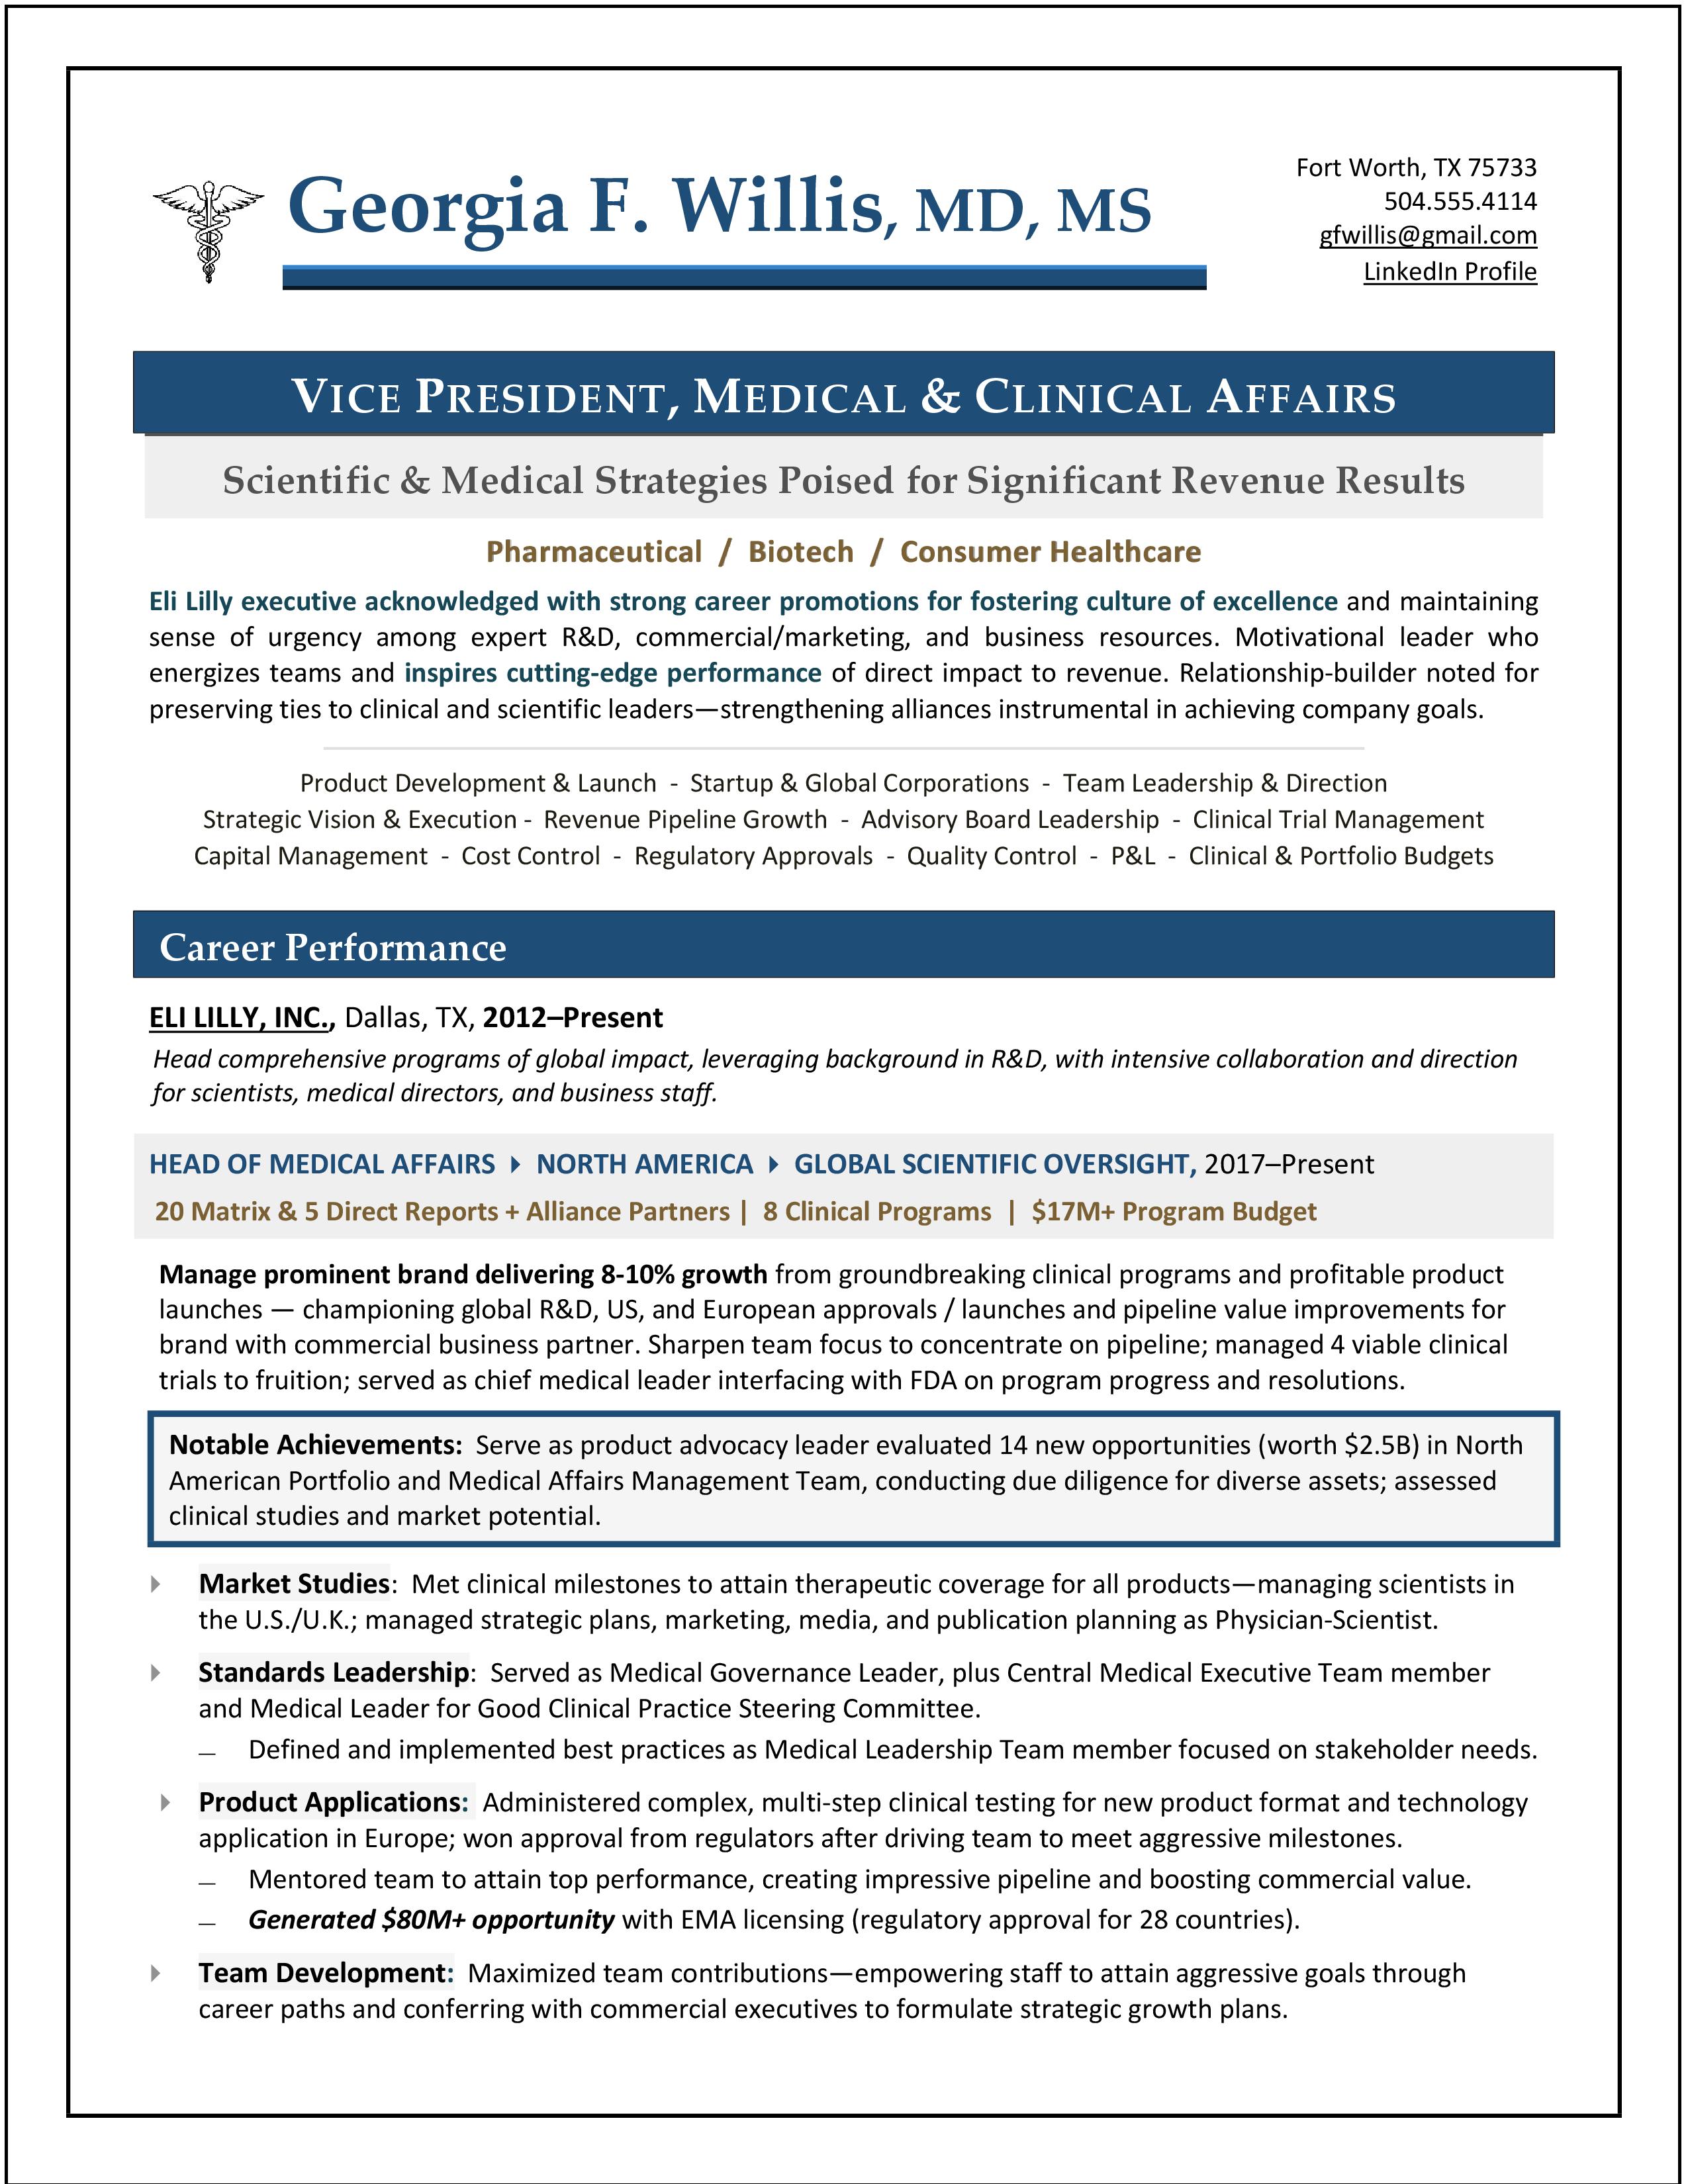 Vp Medical Affairs Resume Vp Clinical Affairs Resume Executive Resume Resume Writer Best Essay Writing Service